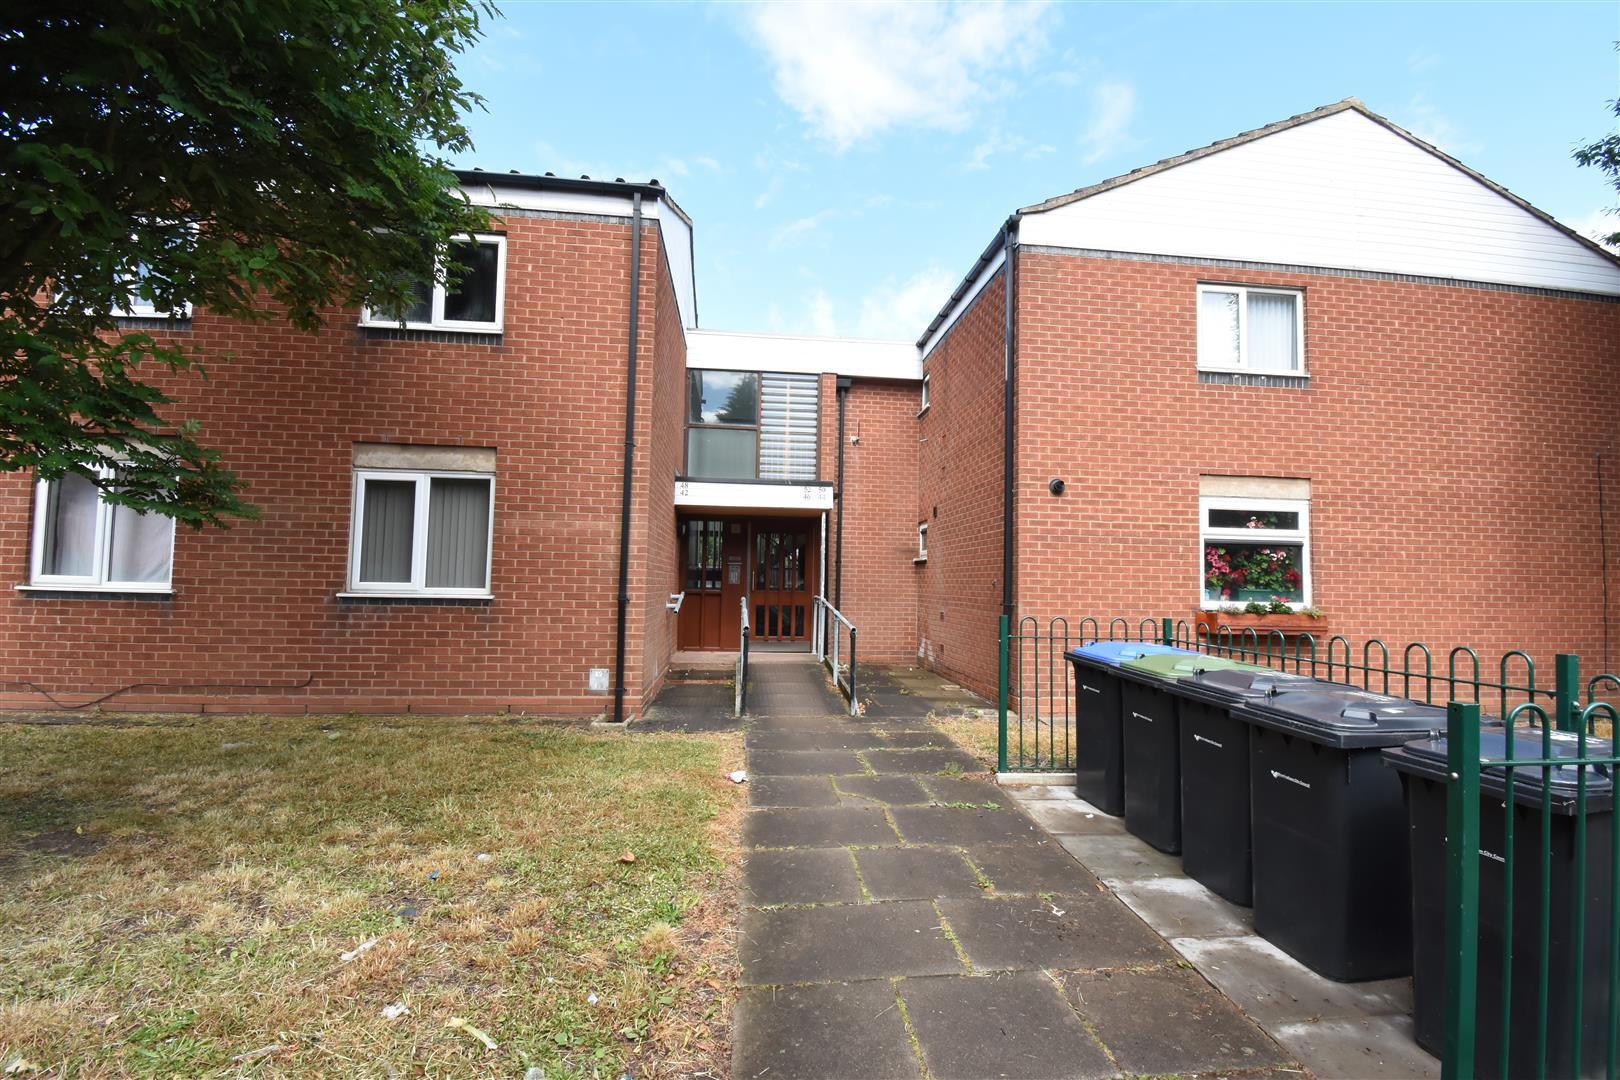 2 bed flat for sale in Kestrel Avenue, Yardley, Birmingham - Property Image 1